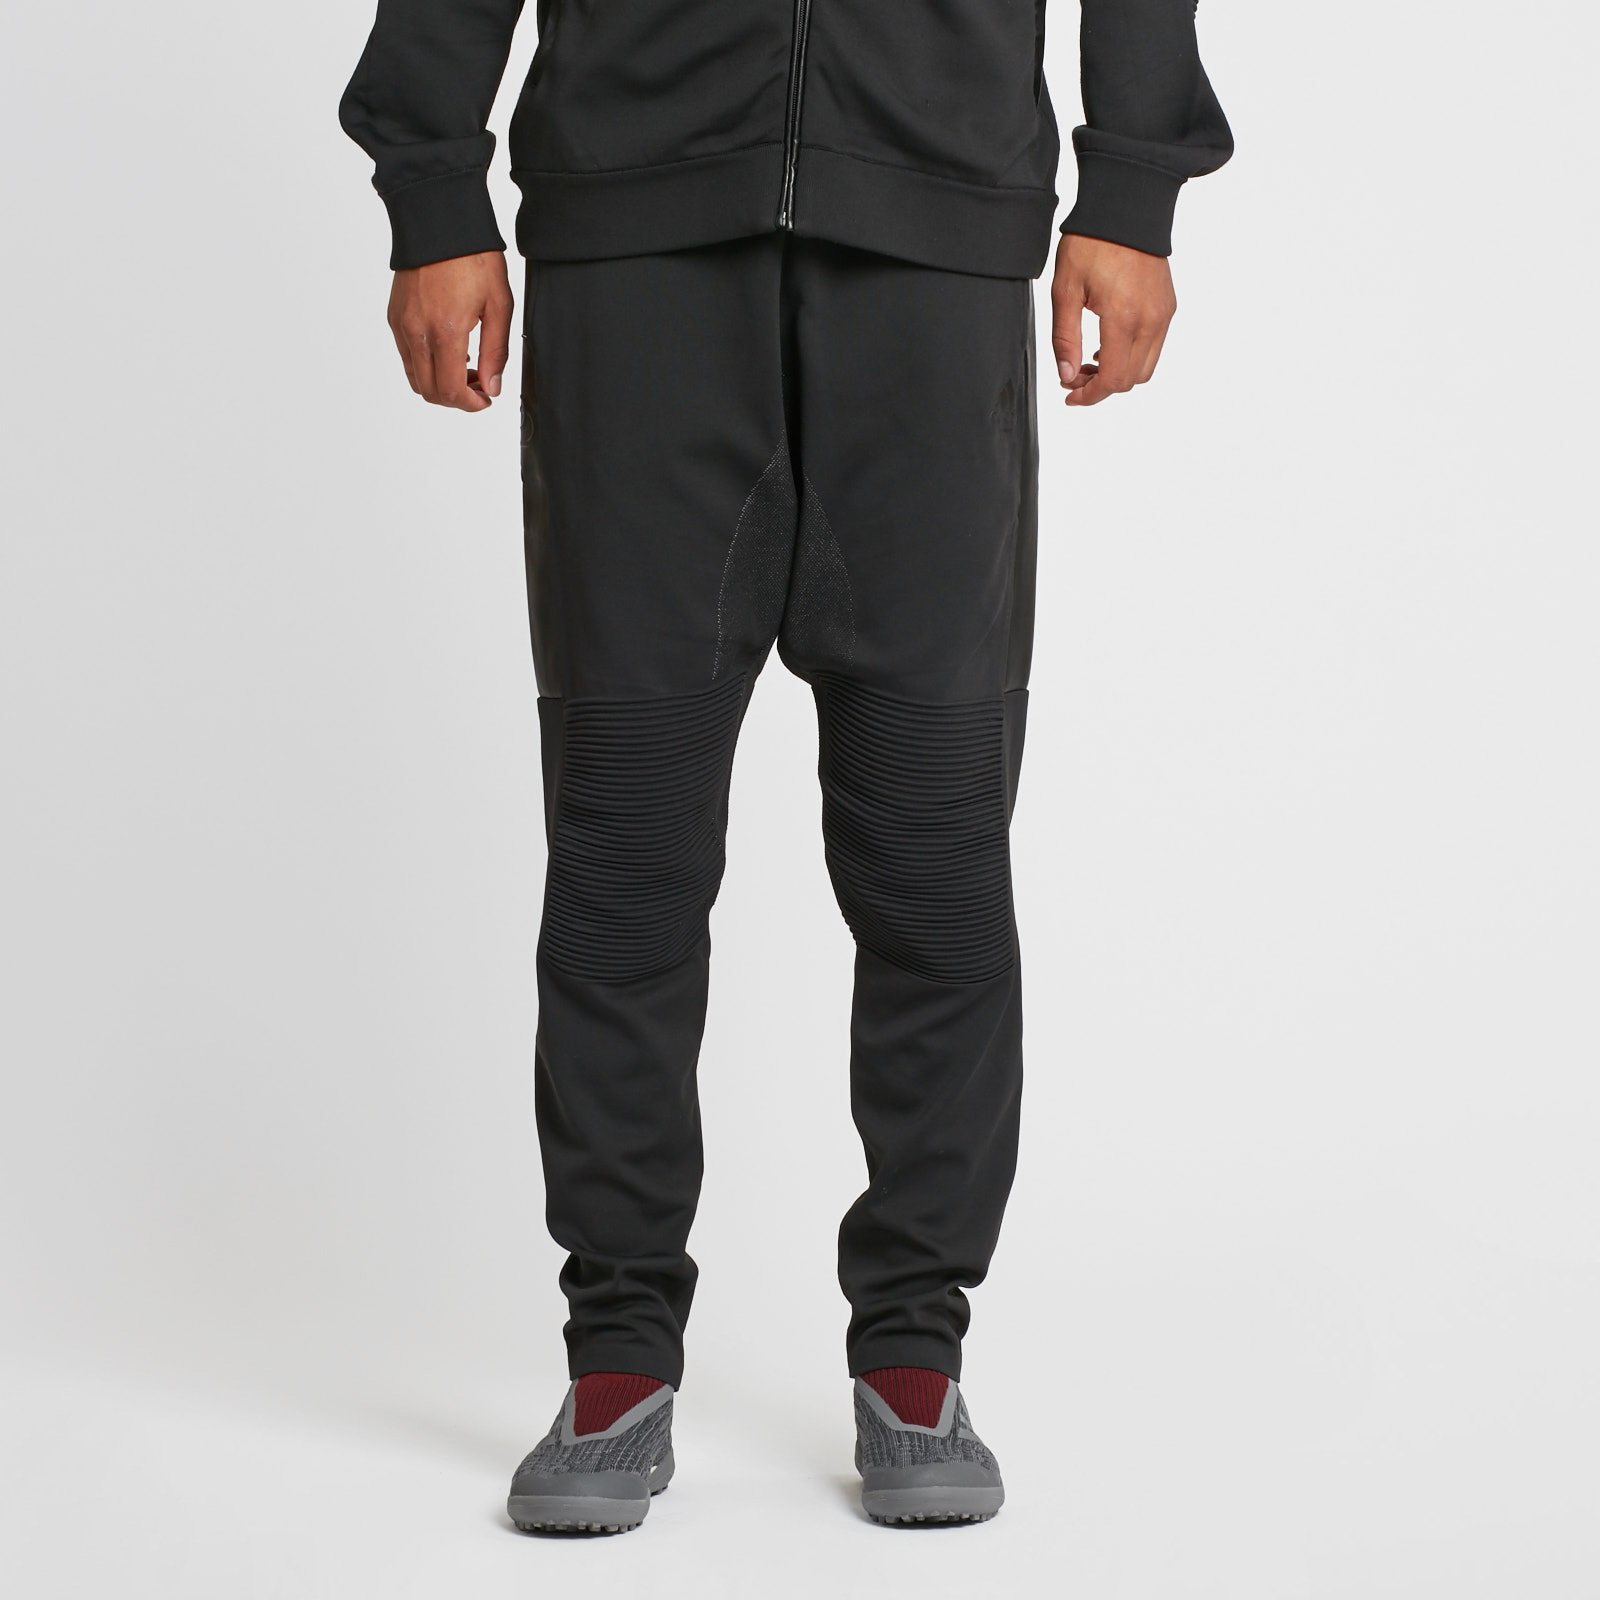 34451ed99 adidas Tan Paul Pogba Knit Pant - Cg1845 - Sneakersnstuff | sneakers ...